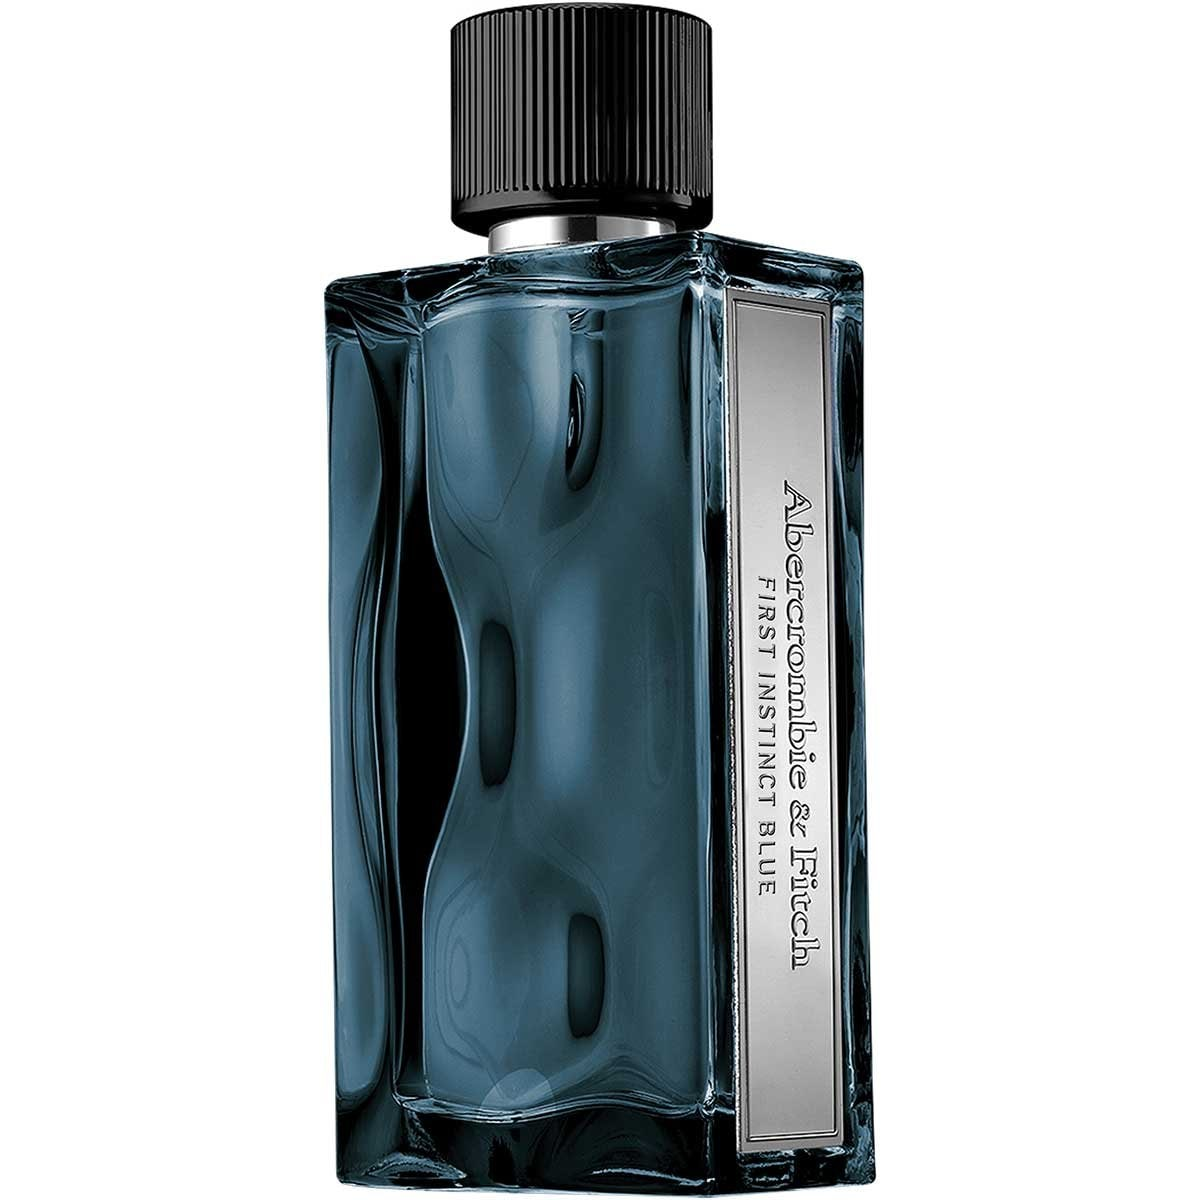 Fragancia para Caballero A&f First Instinct Blue 100Ml